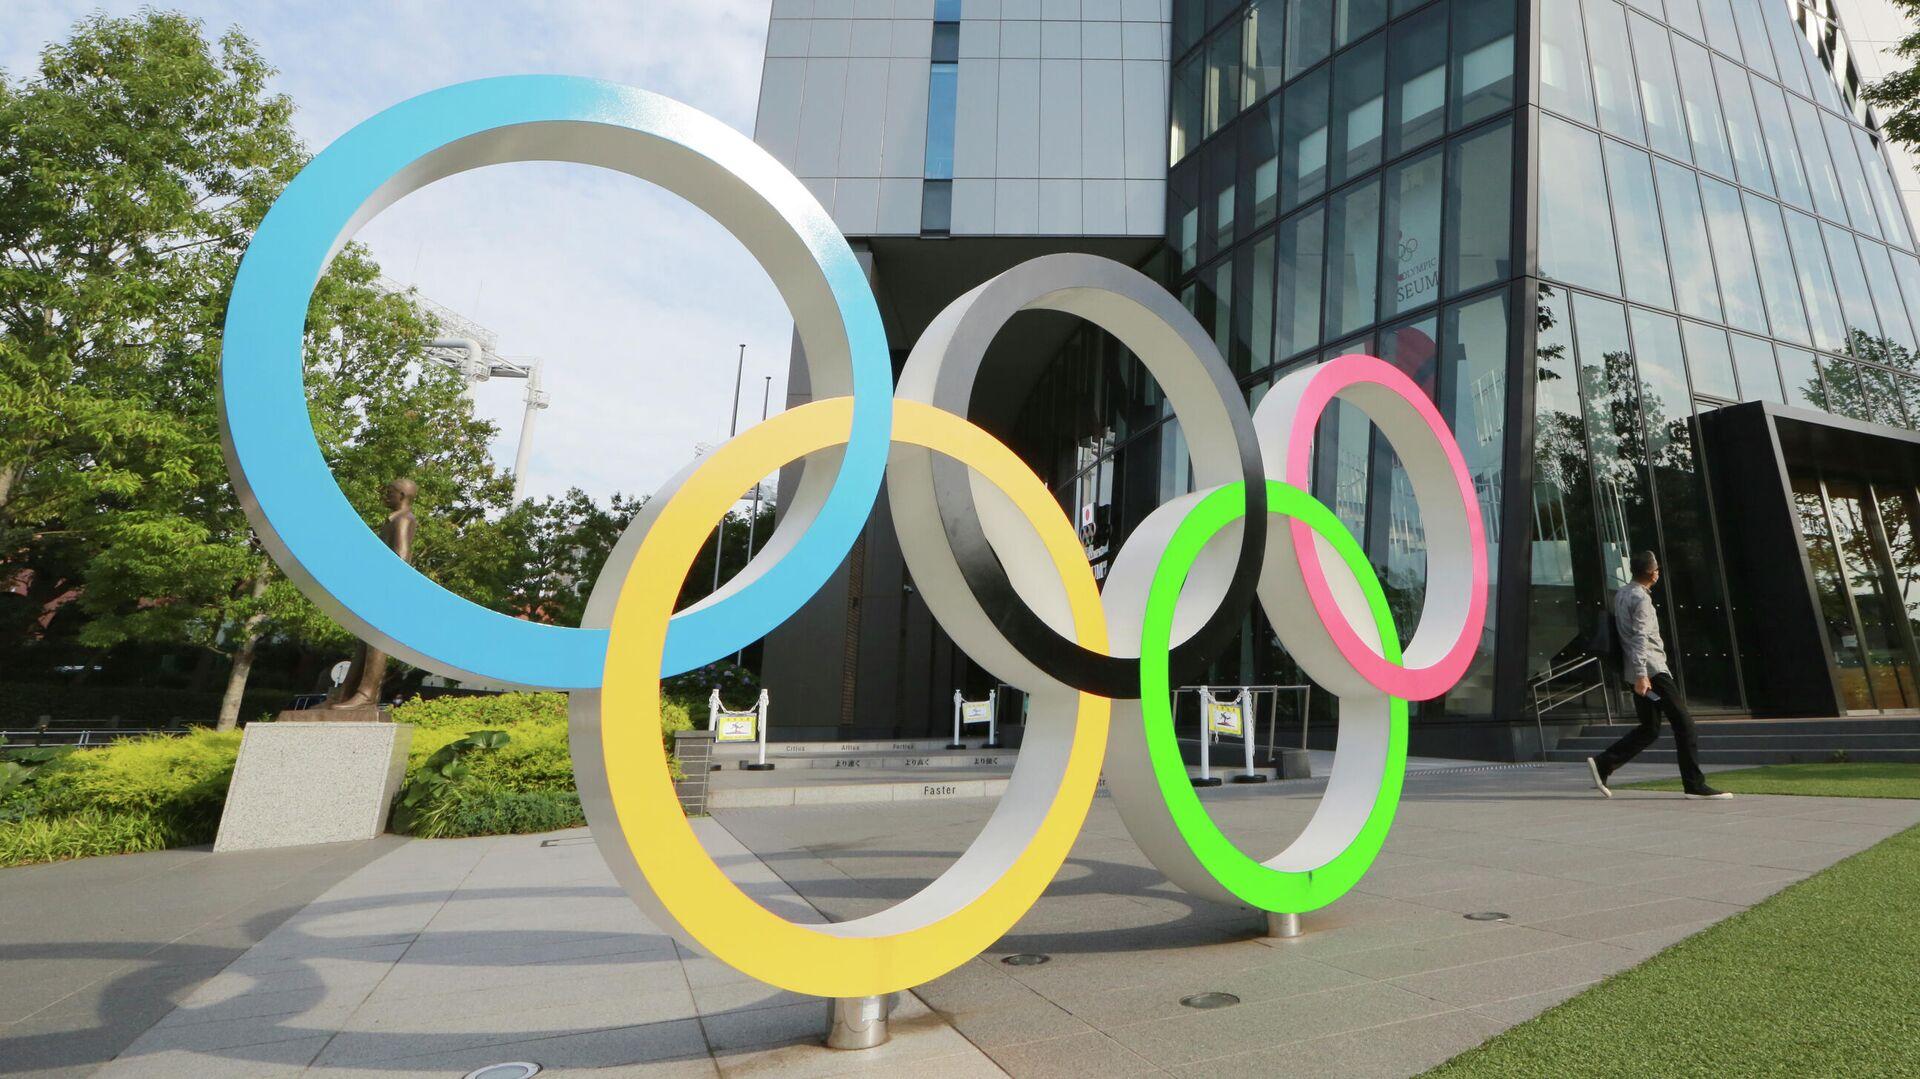 Олимпийские кольца в Токио - РИА Новости, 1920, 08.08.2021